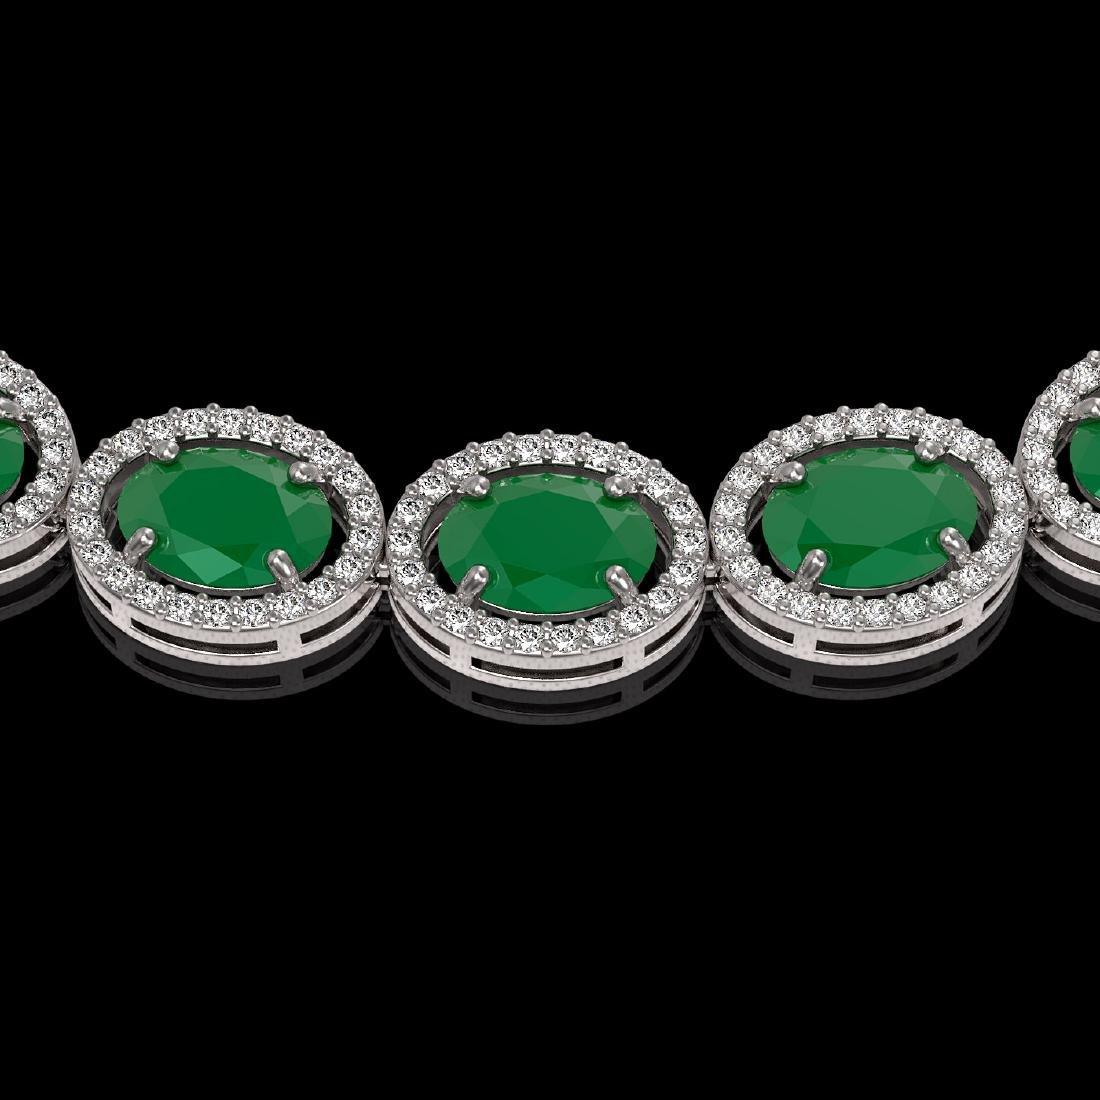 52.15 CTW Emerald & Diamond Halo Necklace 10K White - 3